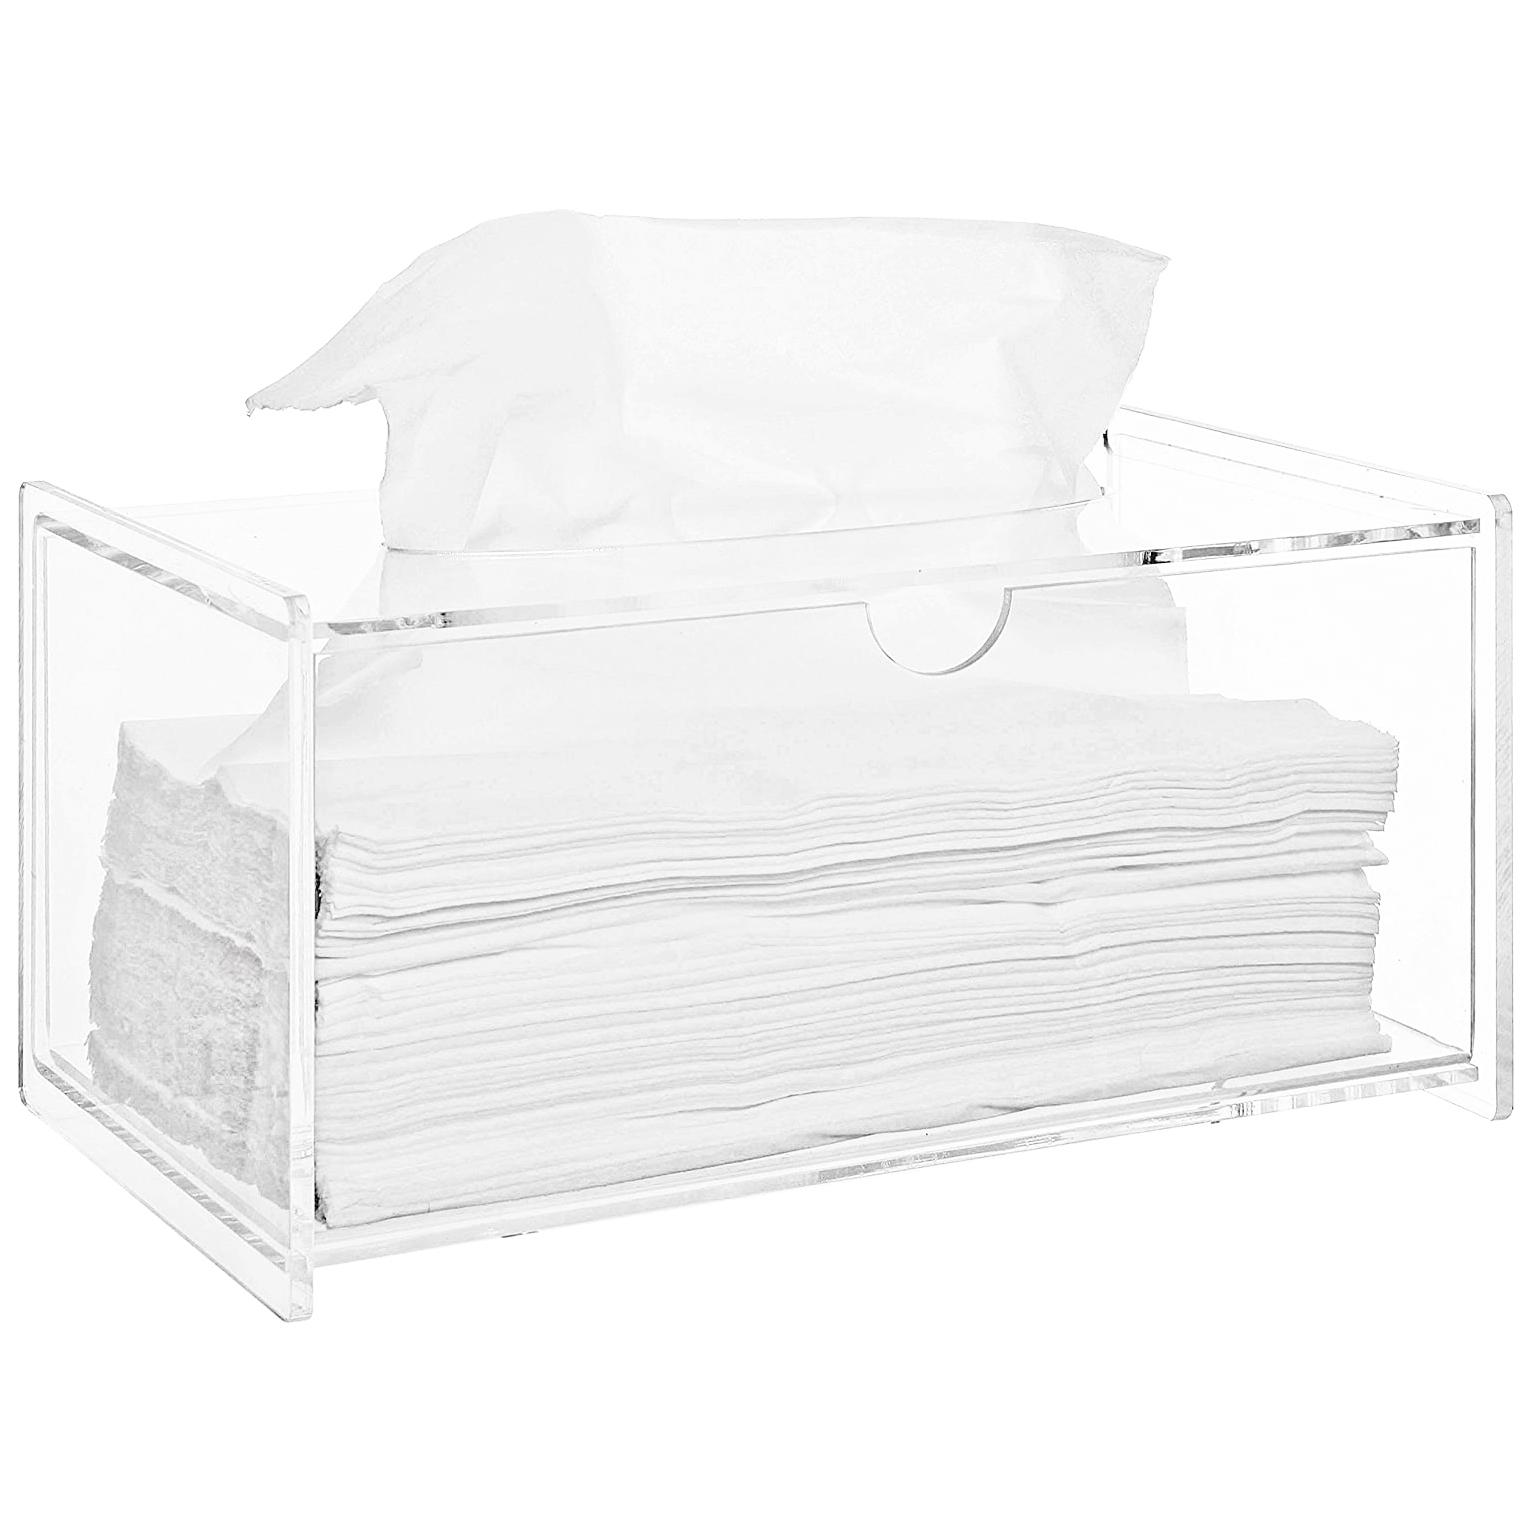 Modern Clear Acrylic Bathroom Facial Tissue Dispenser